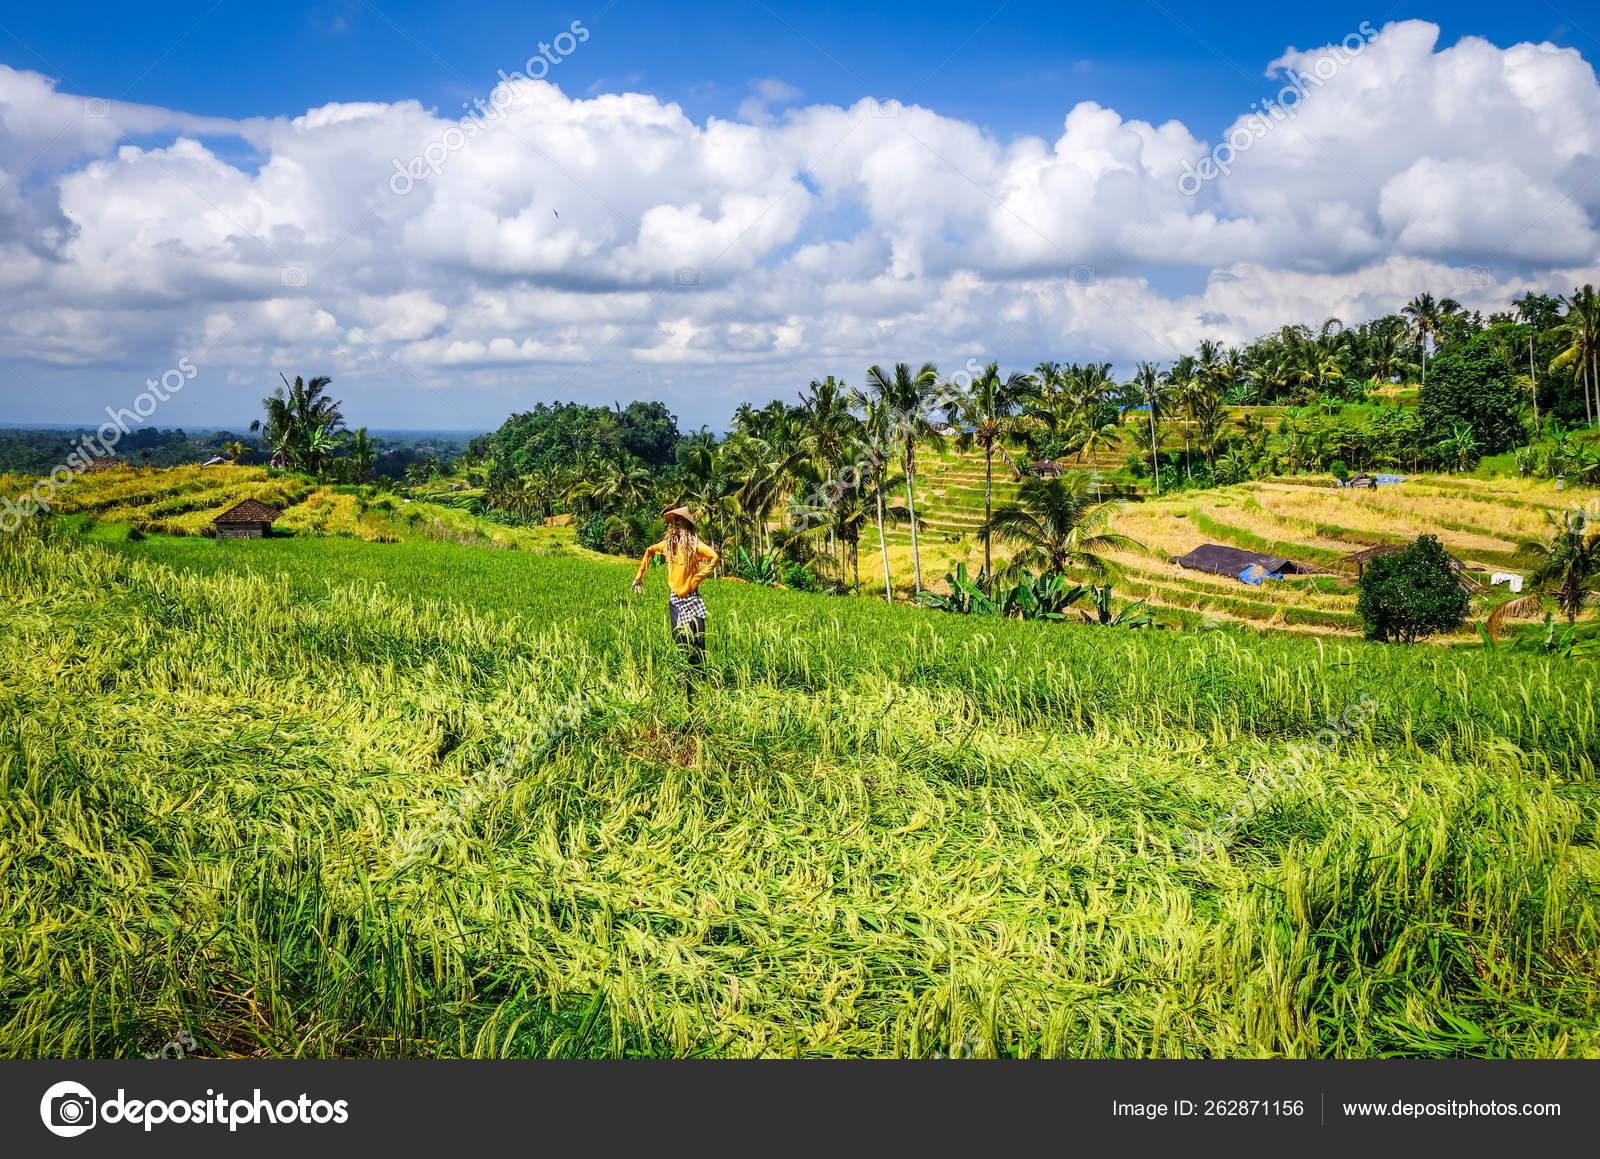 Spaventapasseri In Jatiluwih Risaie Terrazze Di Riso Bali